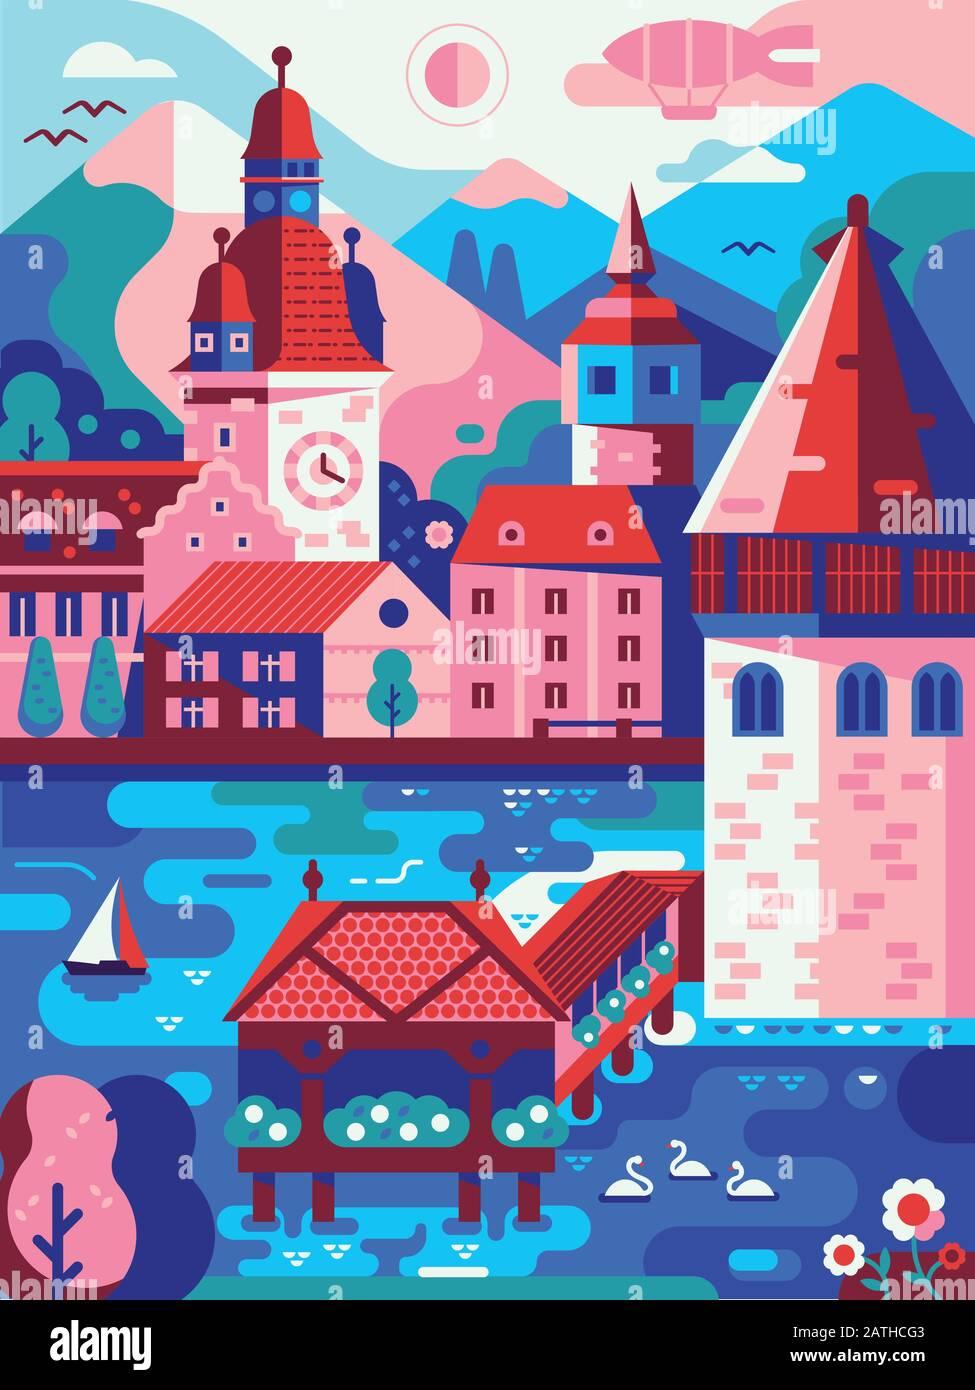 Alps Mountains Stadt Luzerner Vintage Travel Poster Stock Vektor